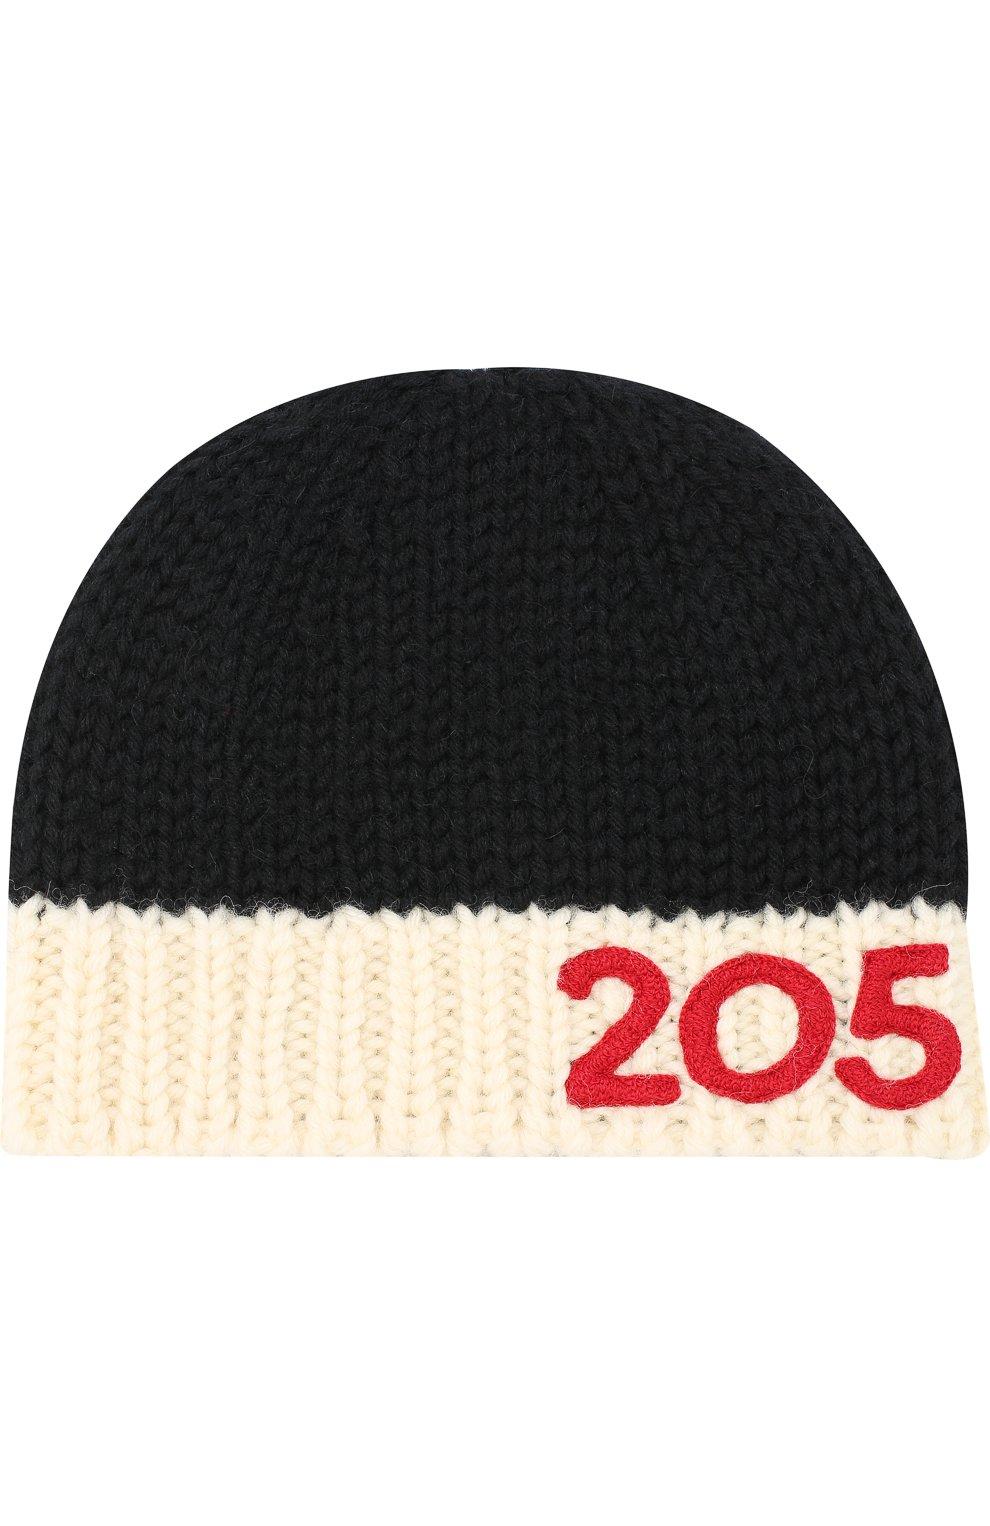 be587d3d2cad Хлопковая шапка